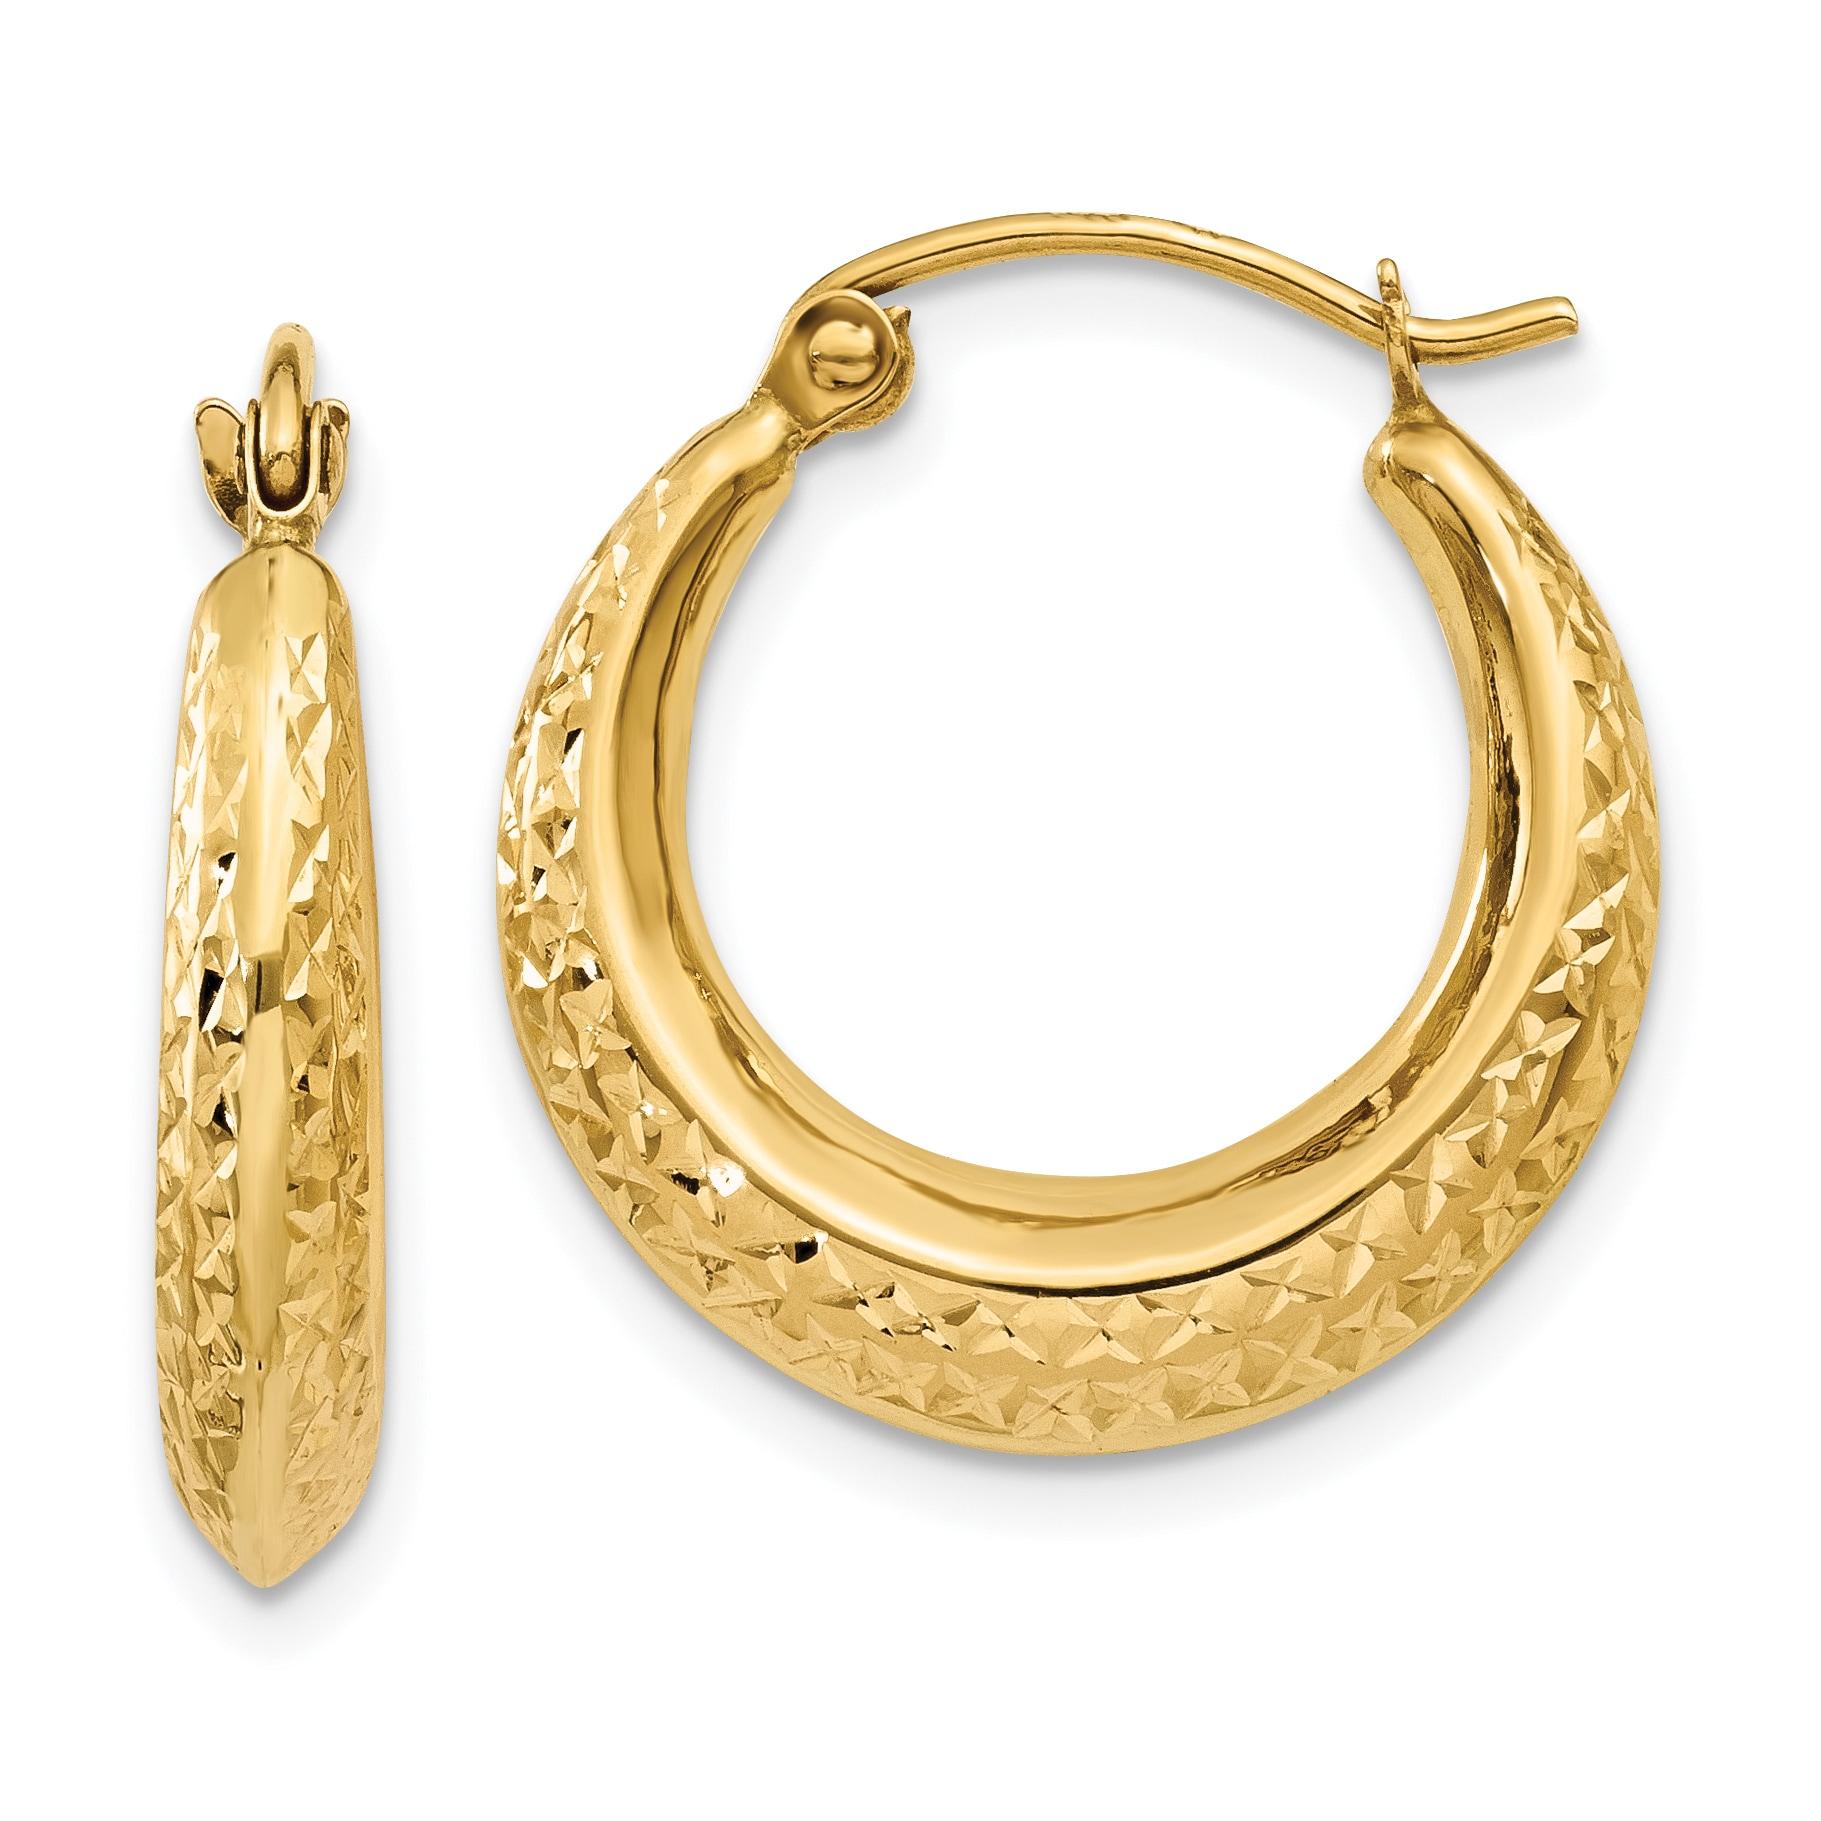 Versil 14 Karat Yellow Gold Textured Hollow Hoop Earrings